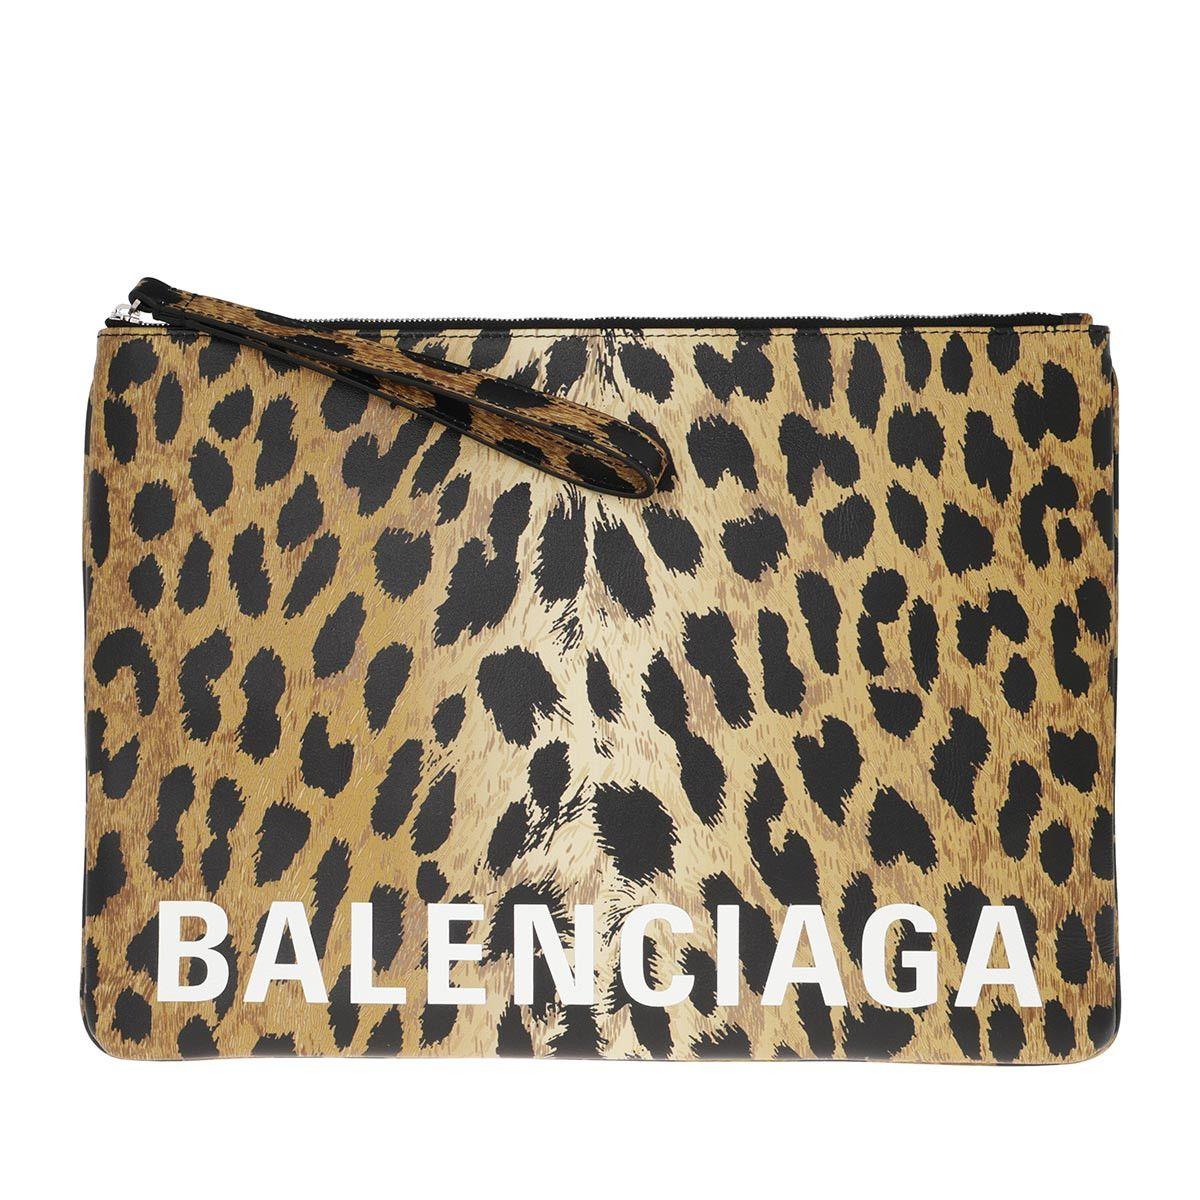 Balenciaga Pochette - Zipped Logo Pouch Multi - in braun - für Damen